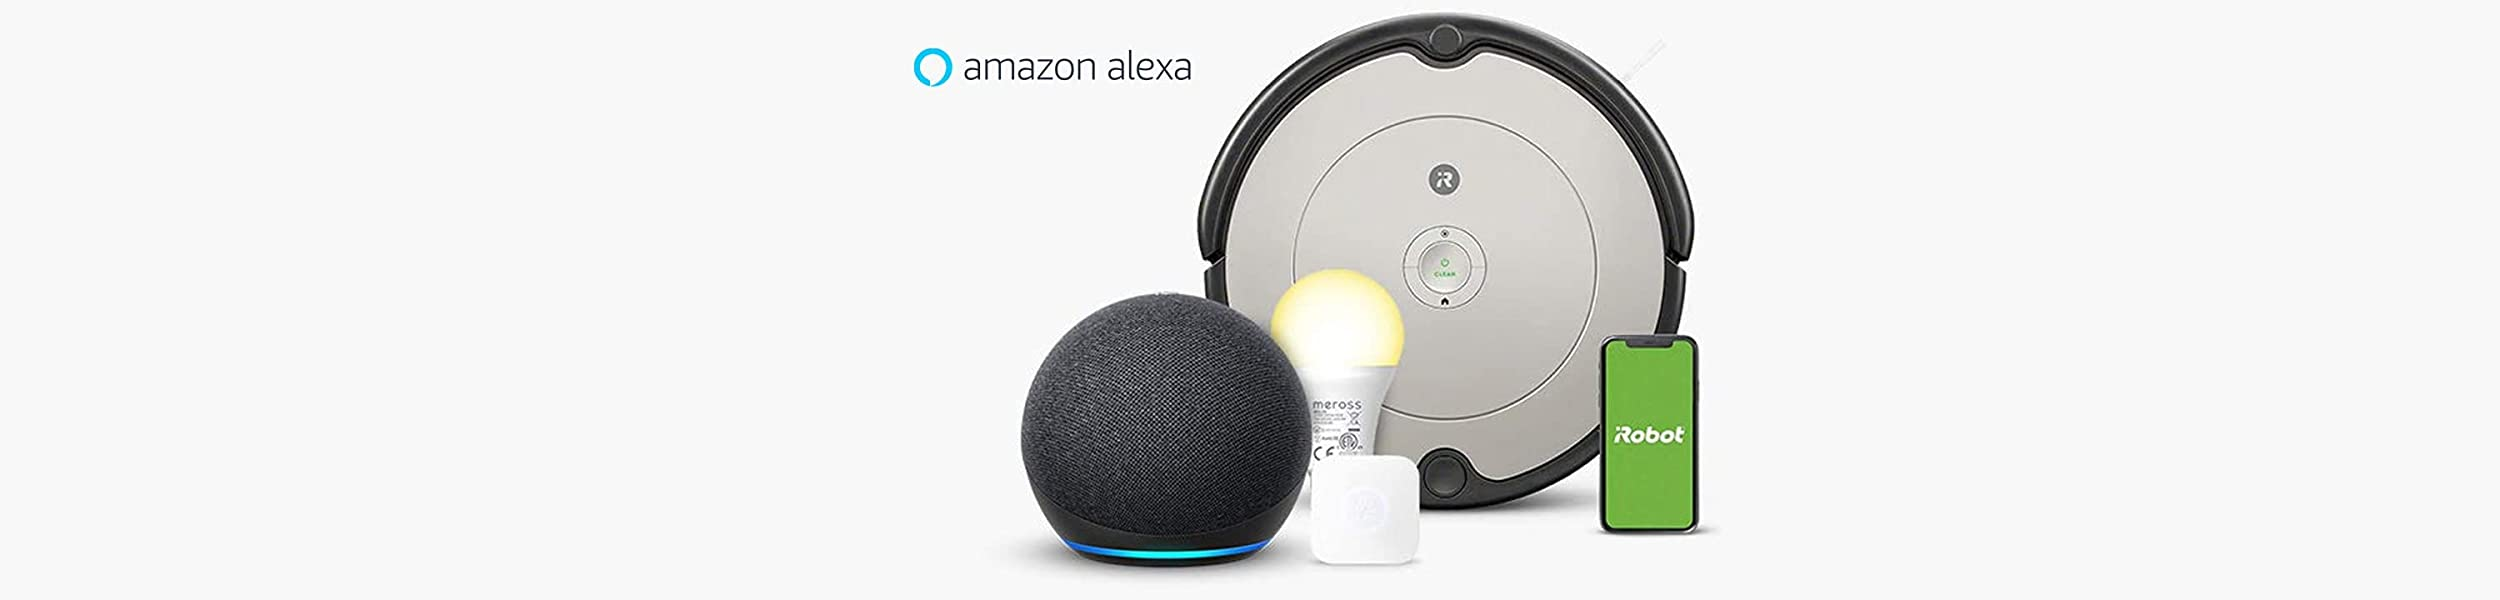 Alexa対応スマートホーム製品がお買い得